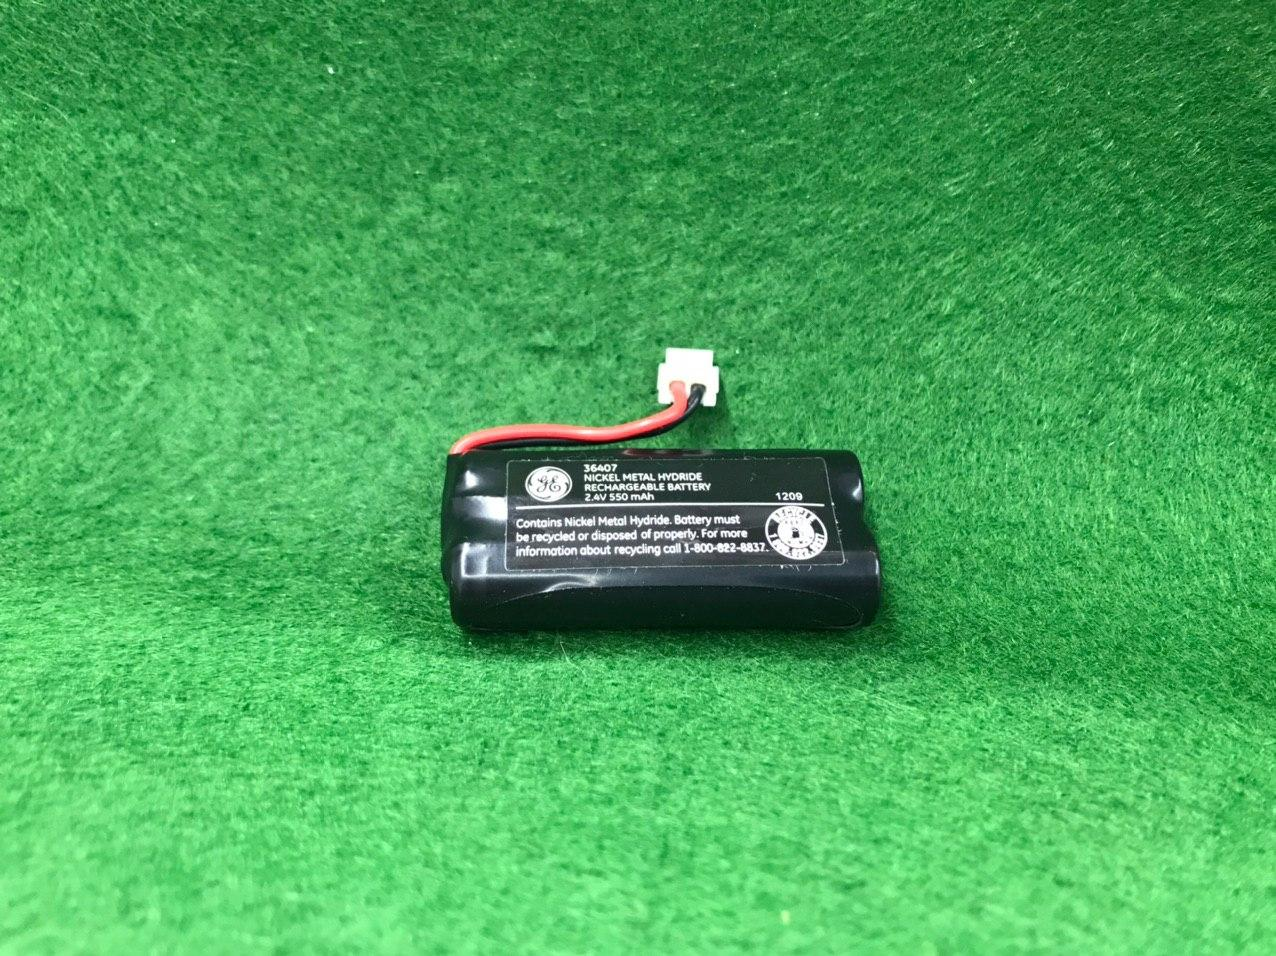 Батарея-акумулятор 550mAh 3.6V - 36407